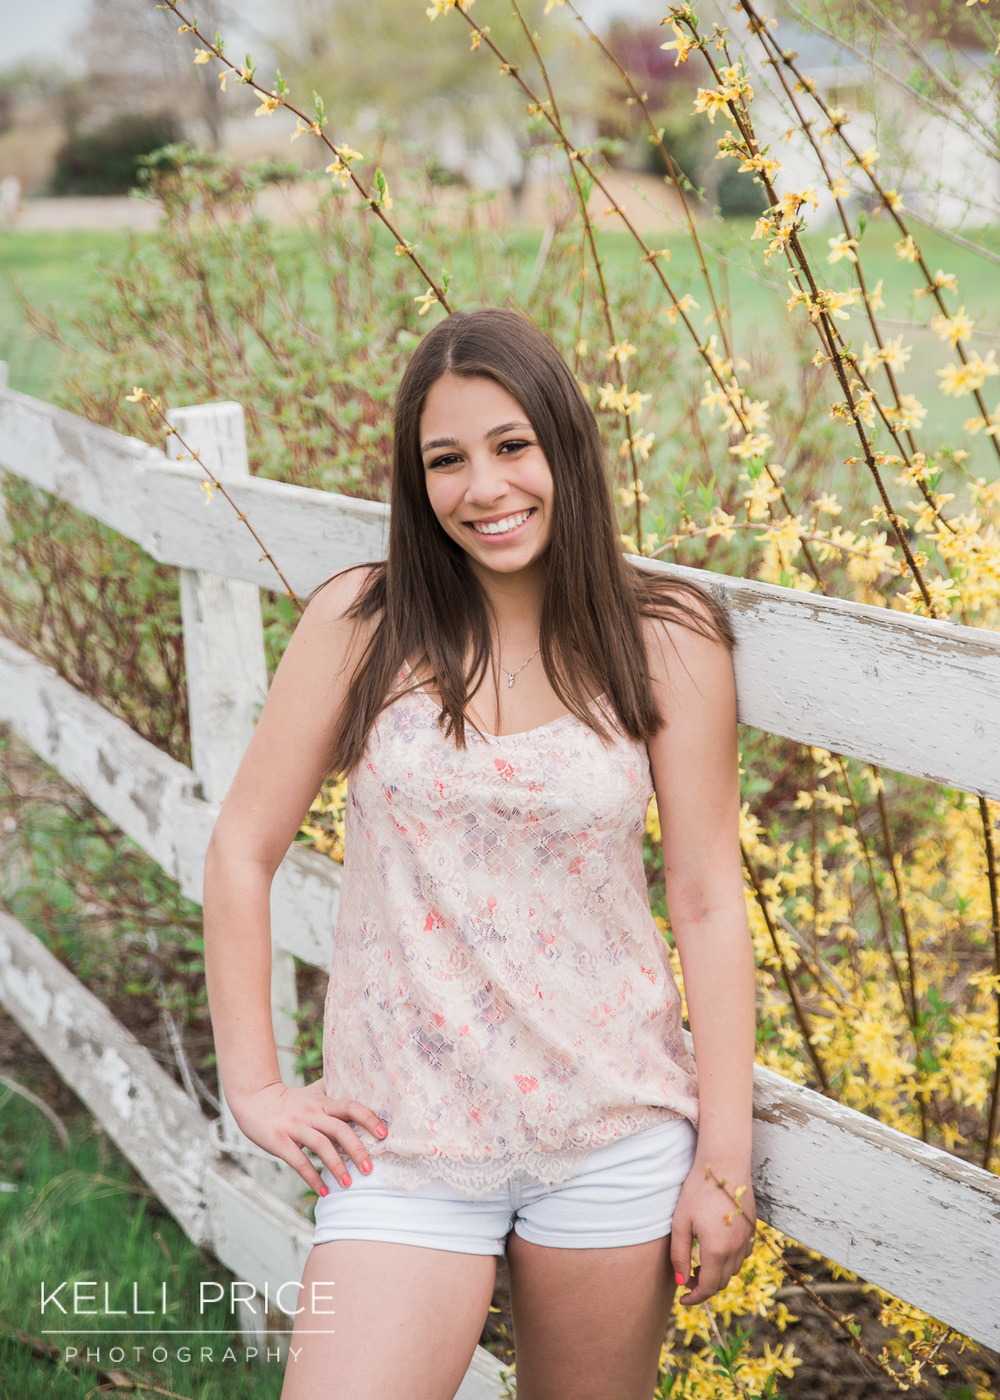 MadisonSeniorPortraits16_KelliPricePhotography_RenoNevadaApril2016.jpg